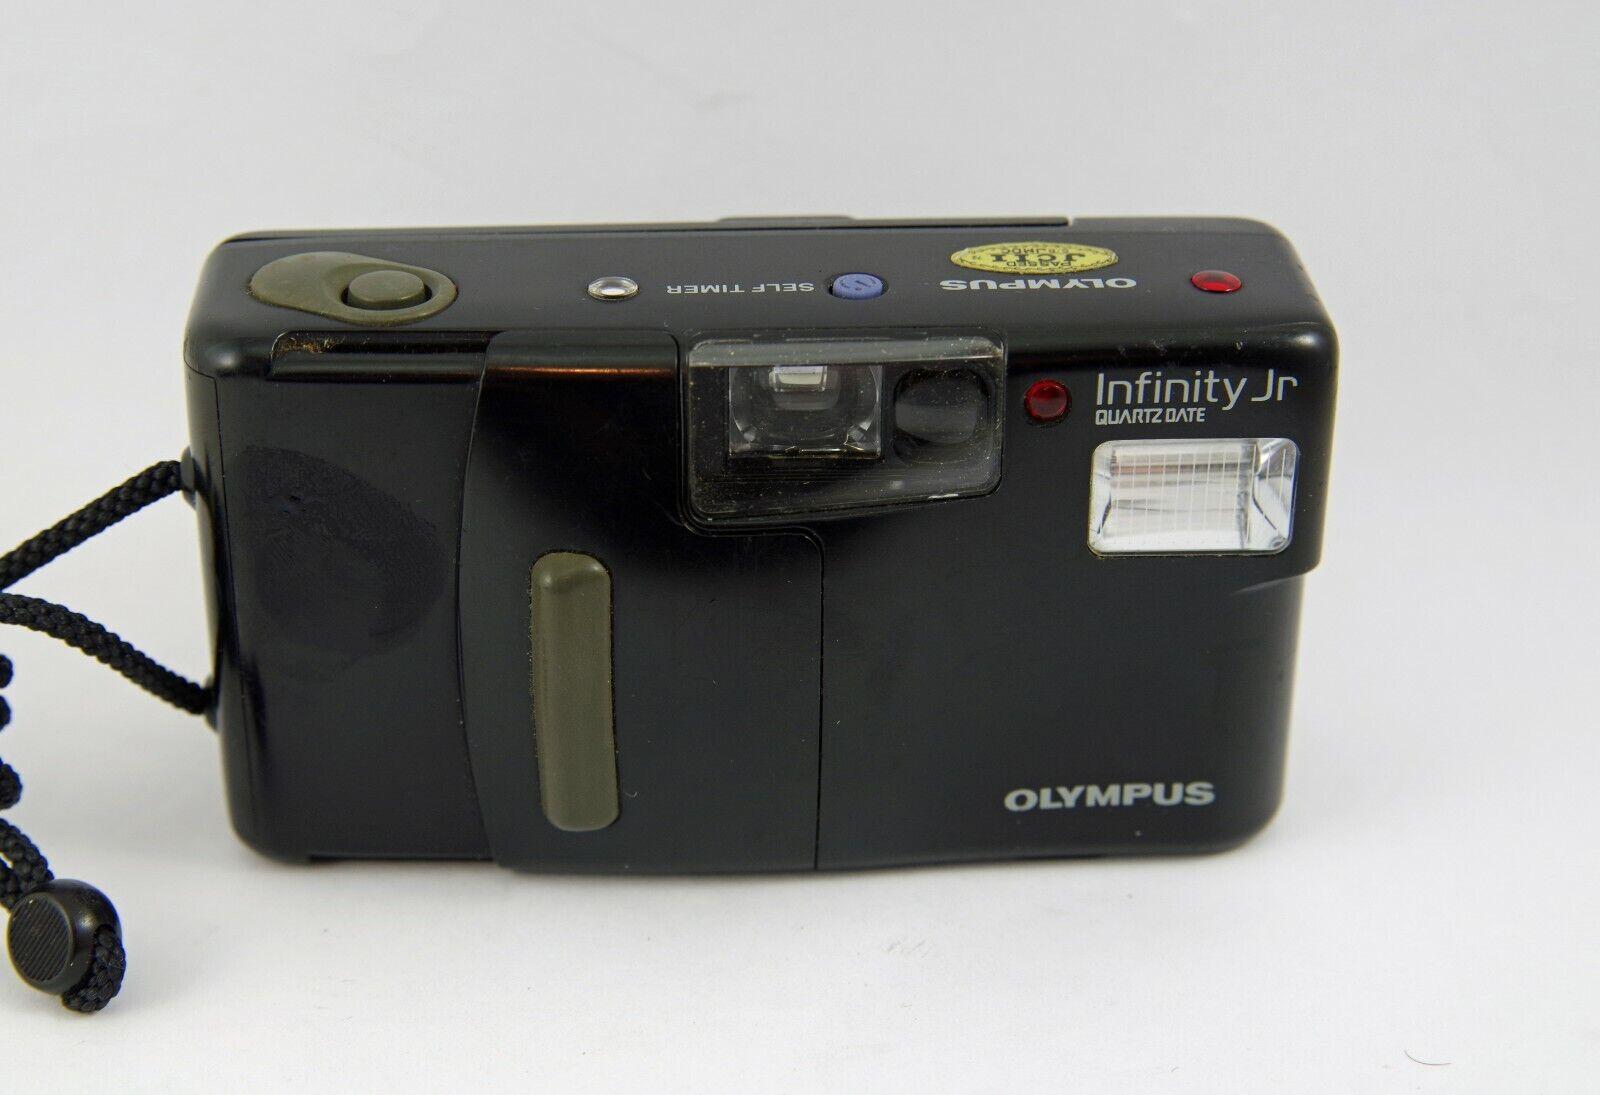 Olympus Infinity Jr. 35mm Point Shoot Film Camera - $49.75